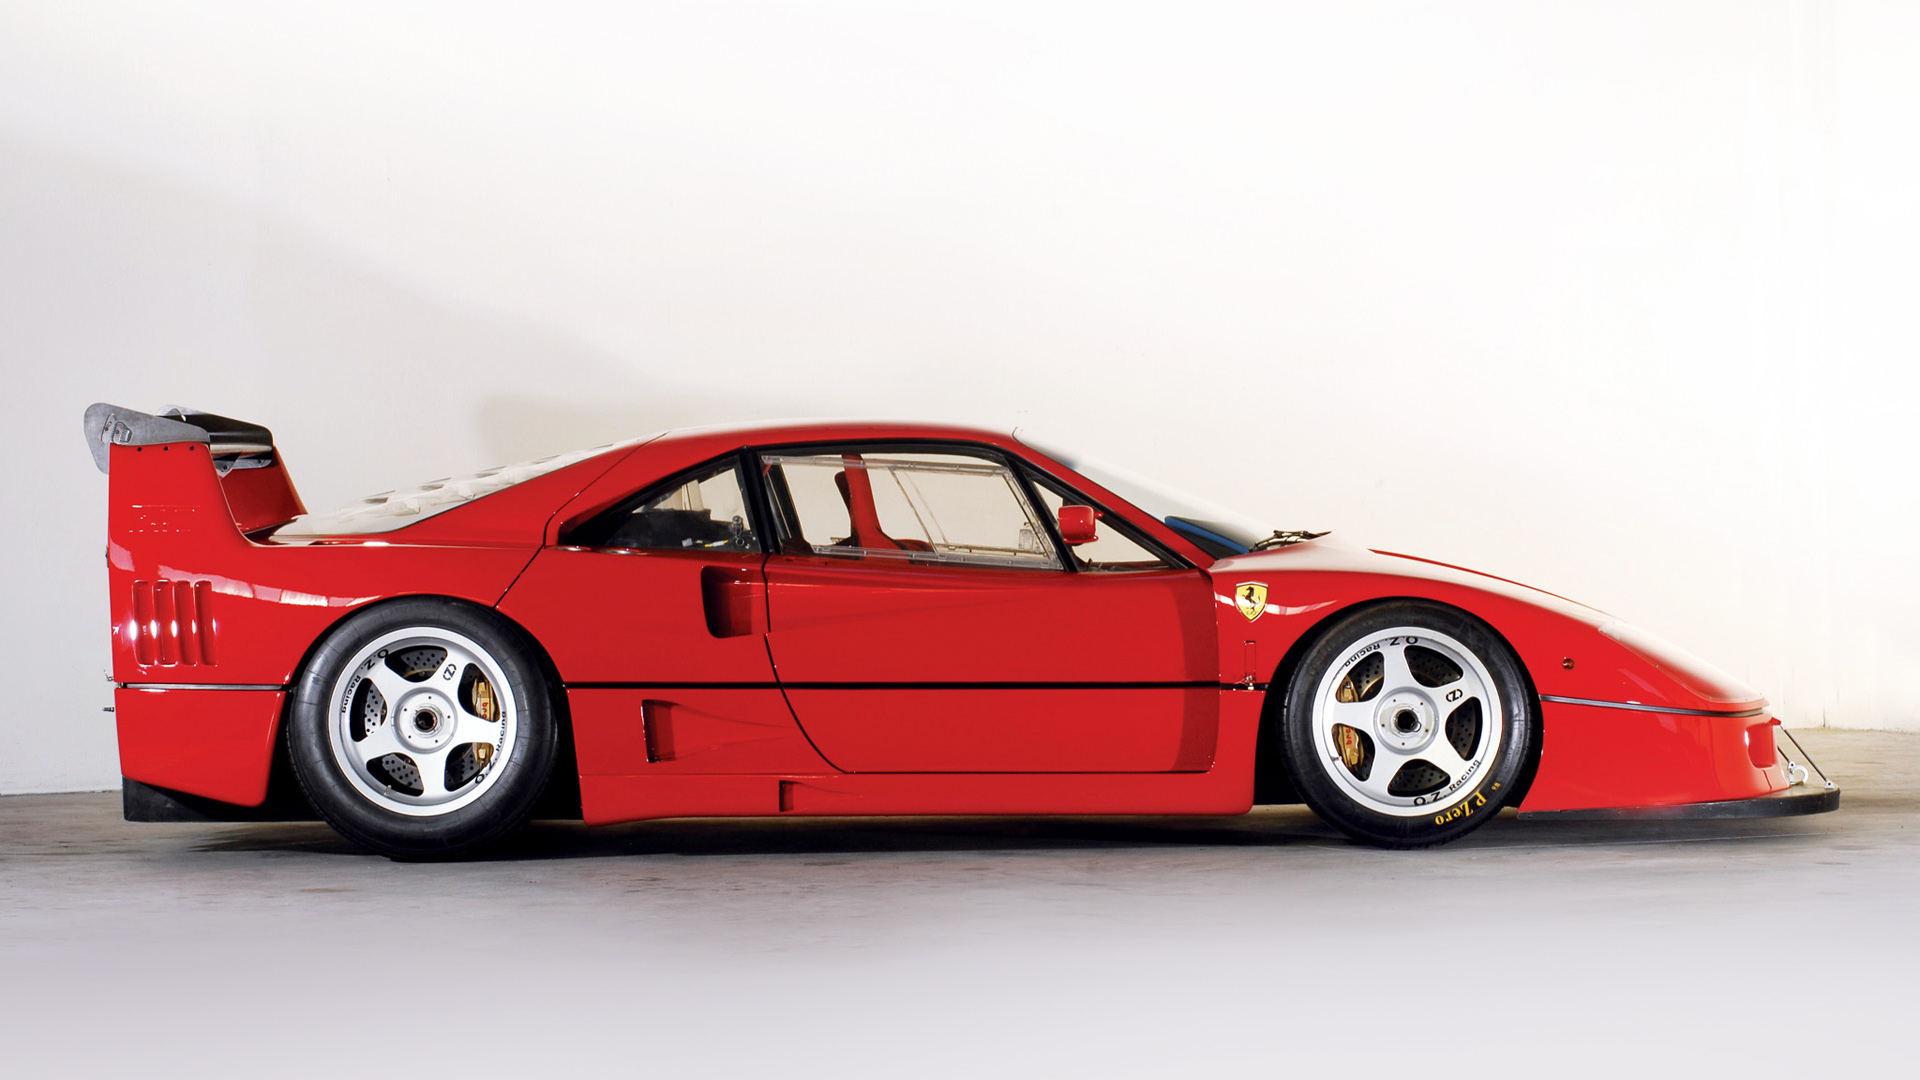 1989 Ferrari F40 LM